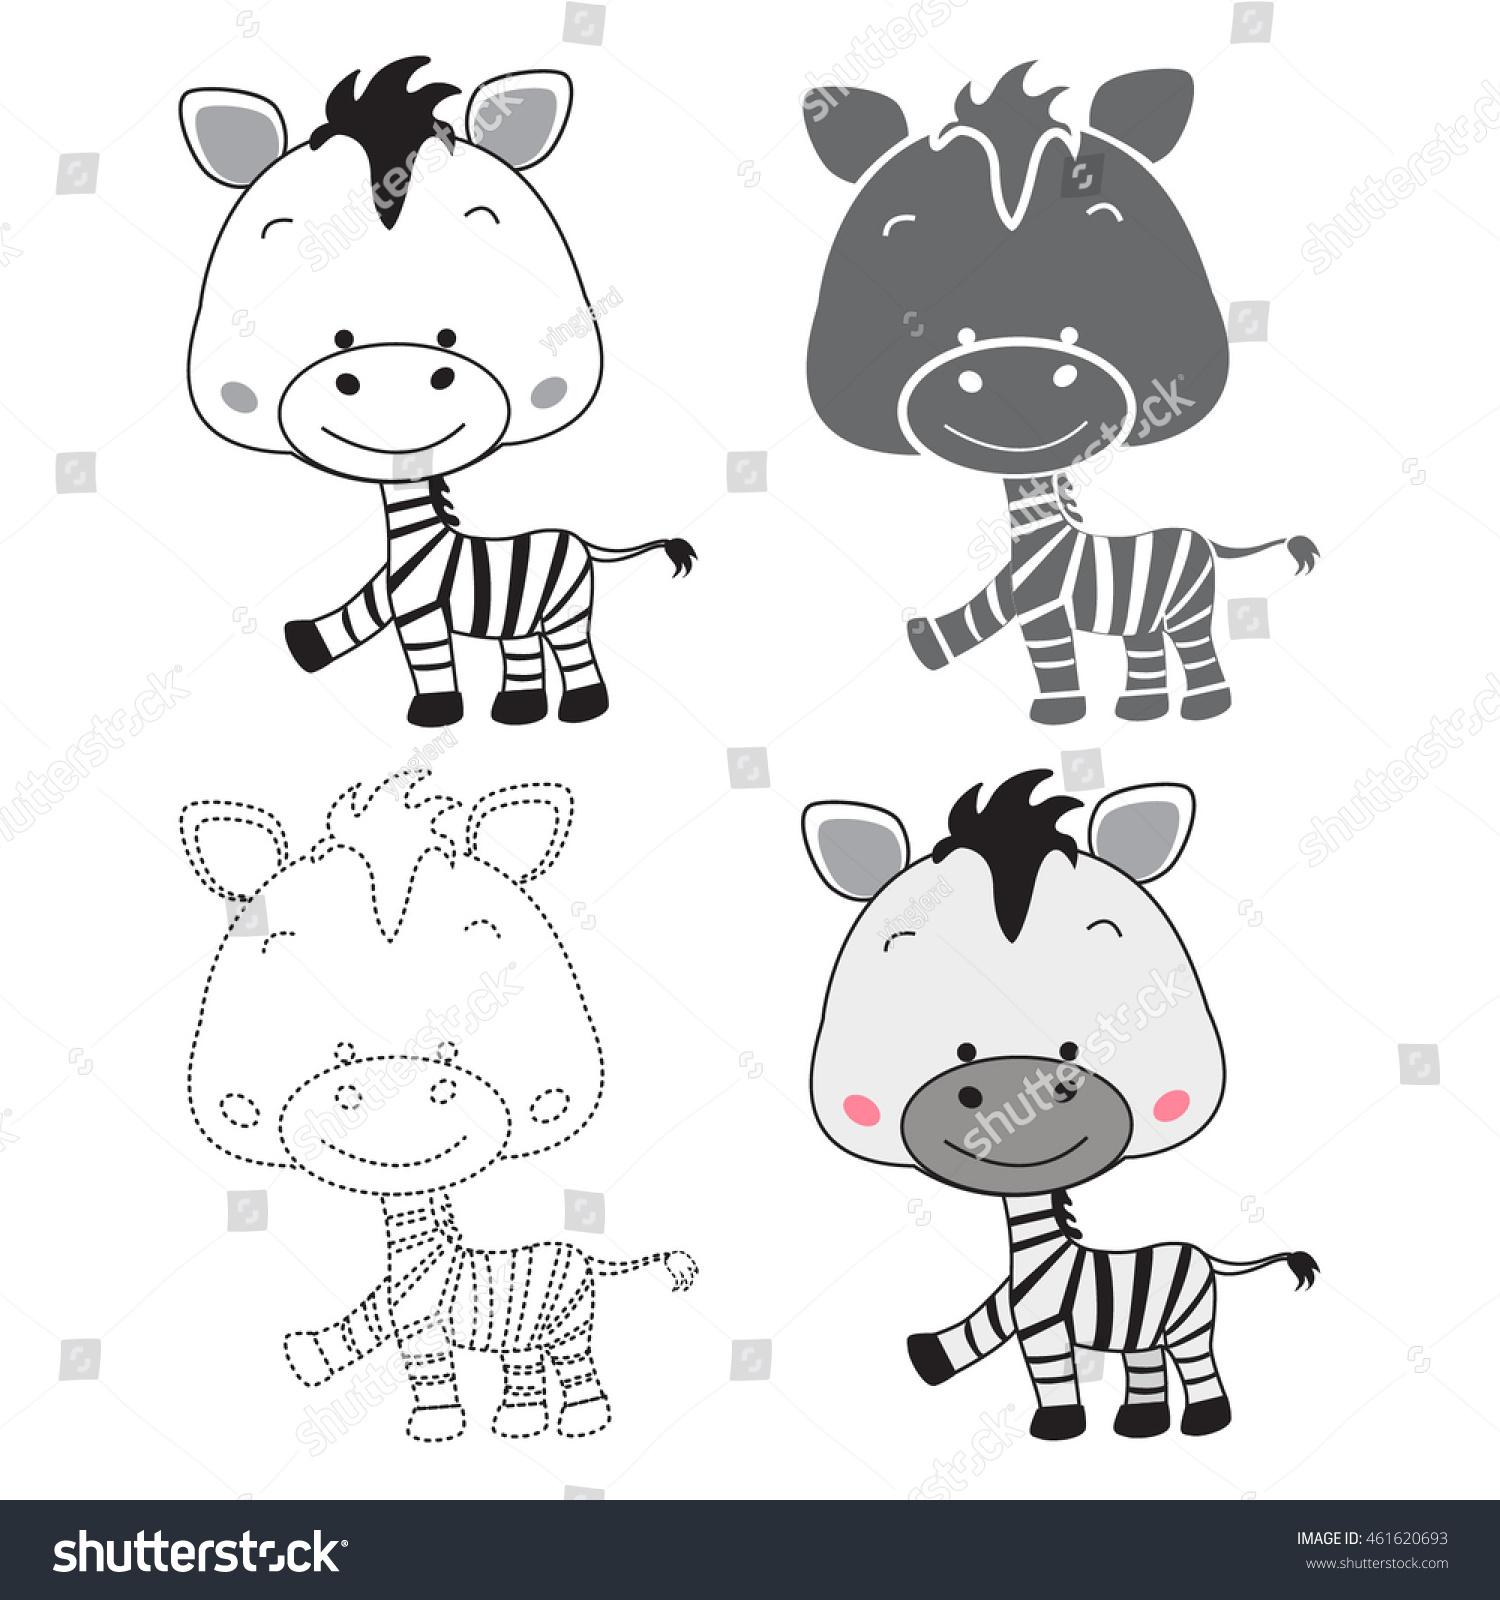 cartoon zebra dot to dot educational game for kidsshadow of zebra